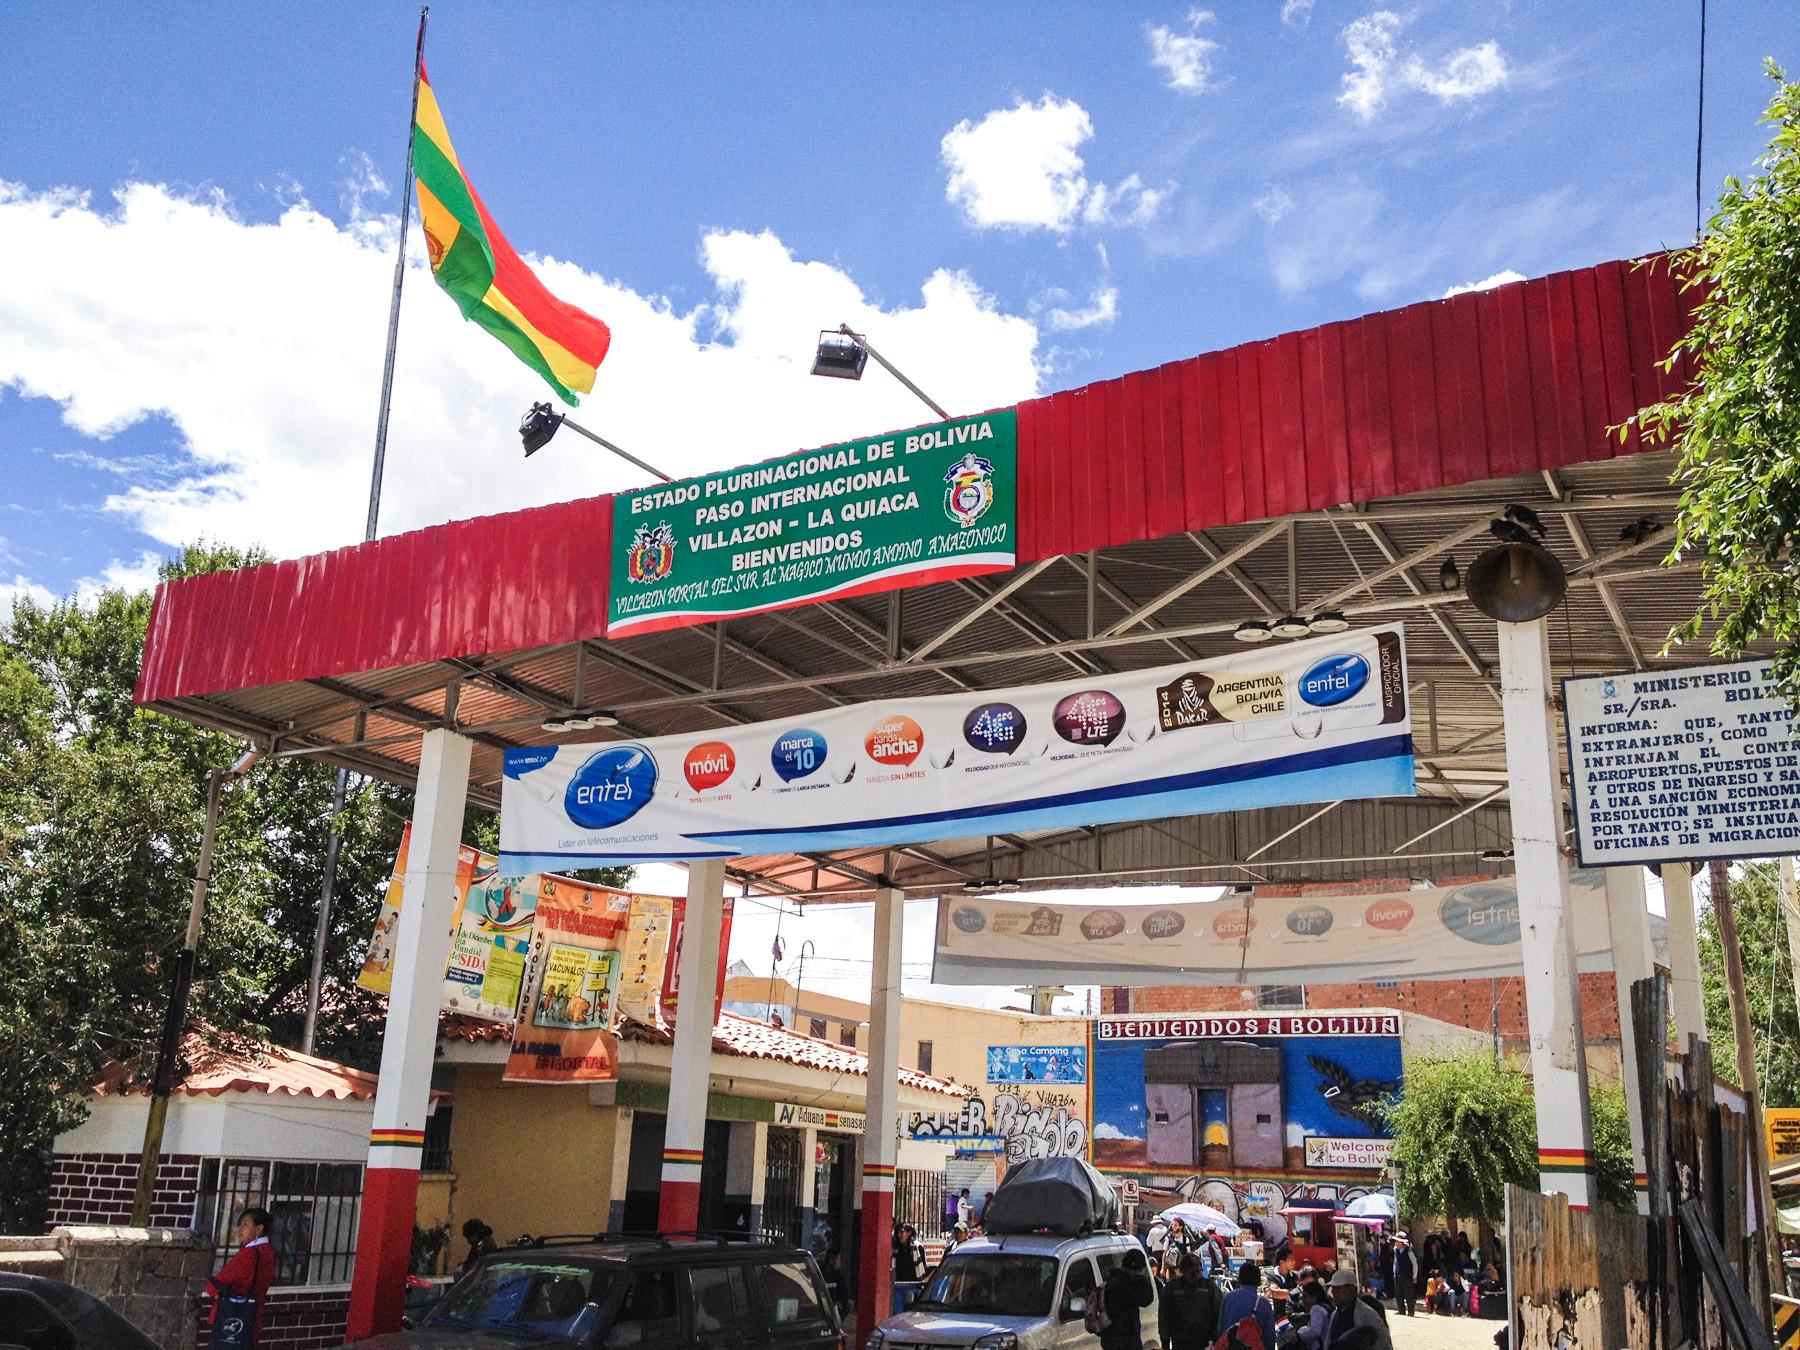 Border crossing with flag and building between Argentina and Bolivia at La Quiaca - Villazon